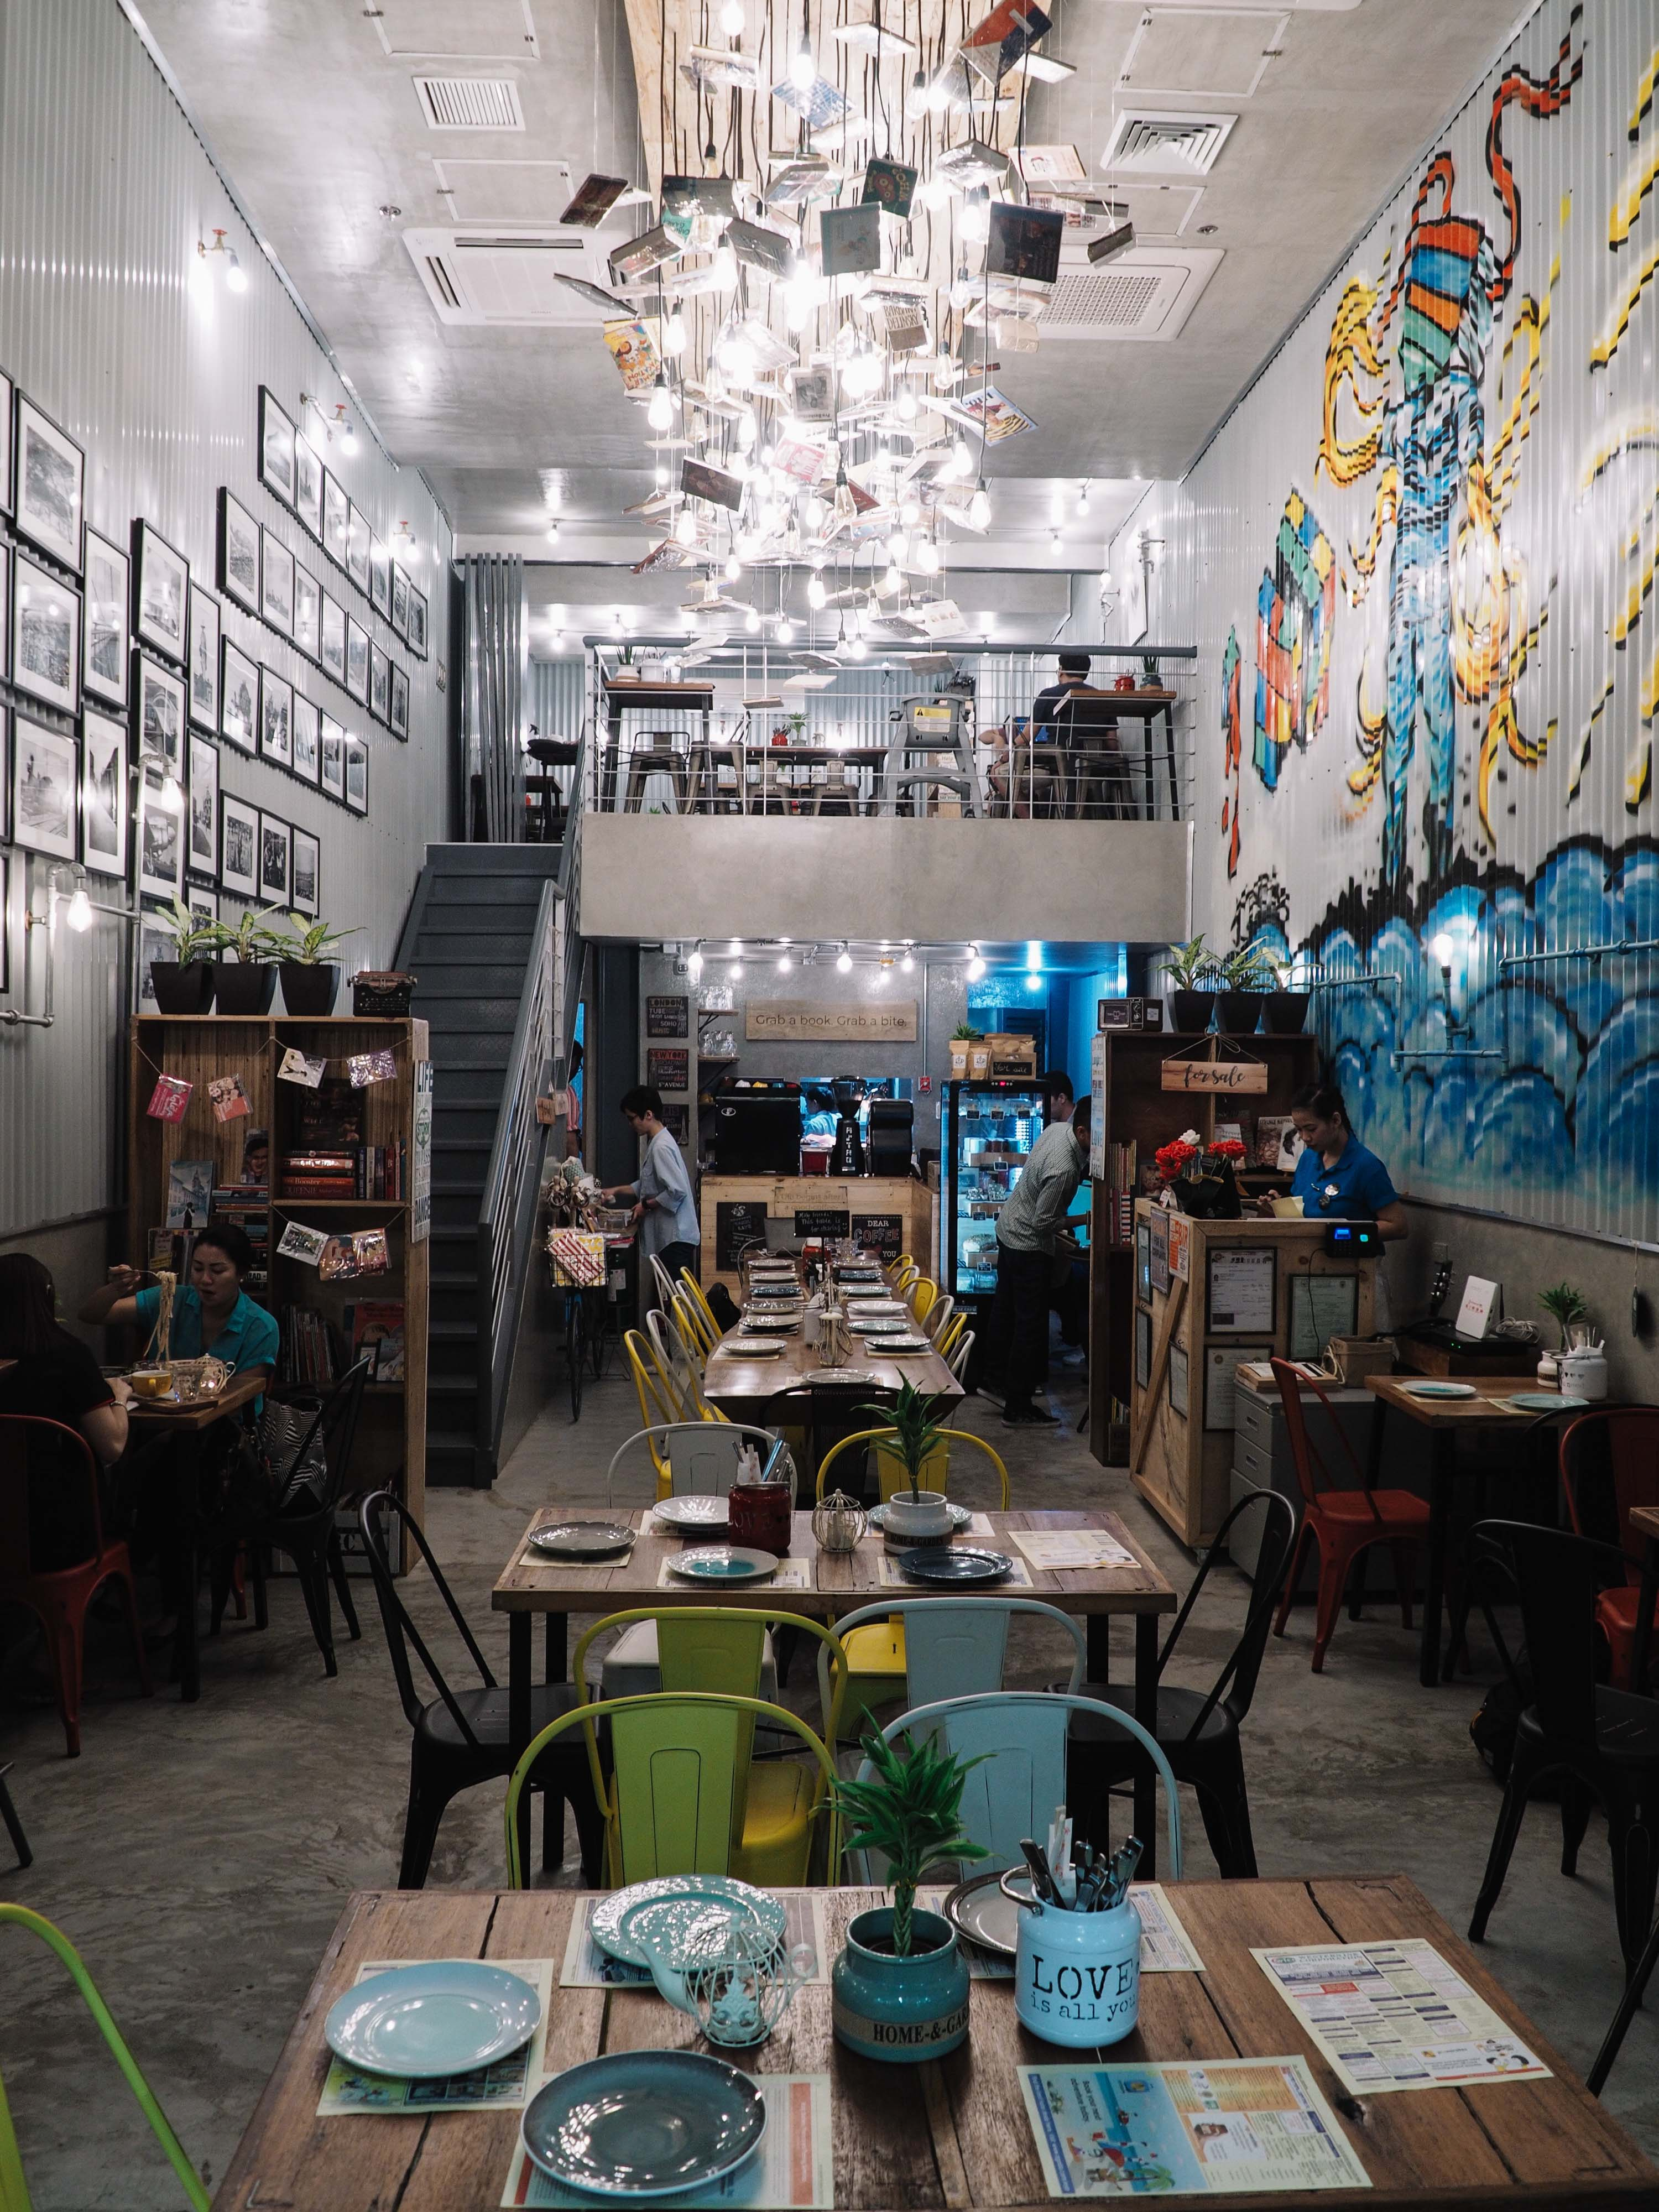 Buku-Buku Kafe's walls are similar to that of a trailer truck with graffiti and photographs hung on them.